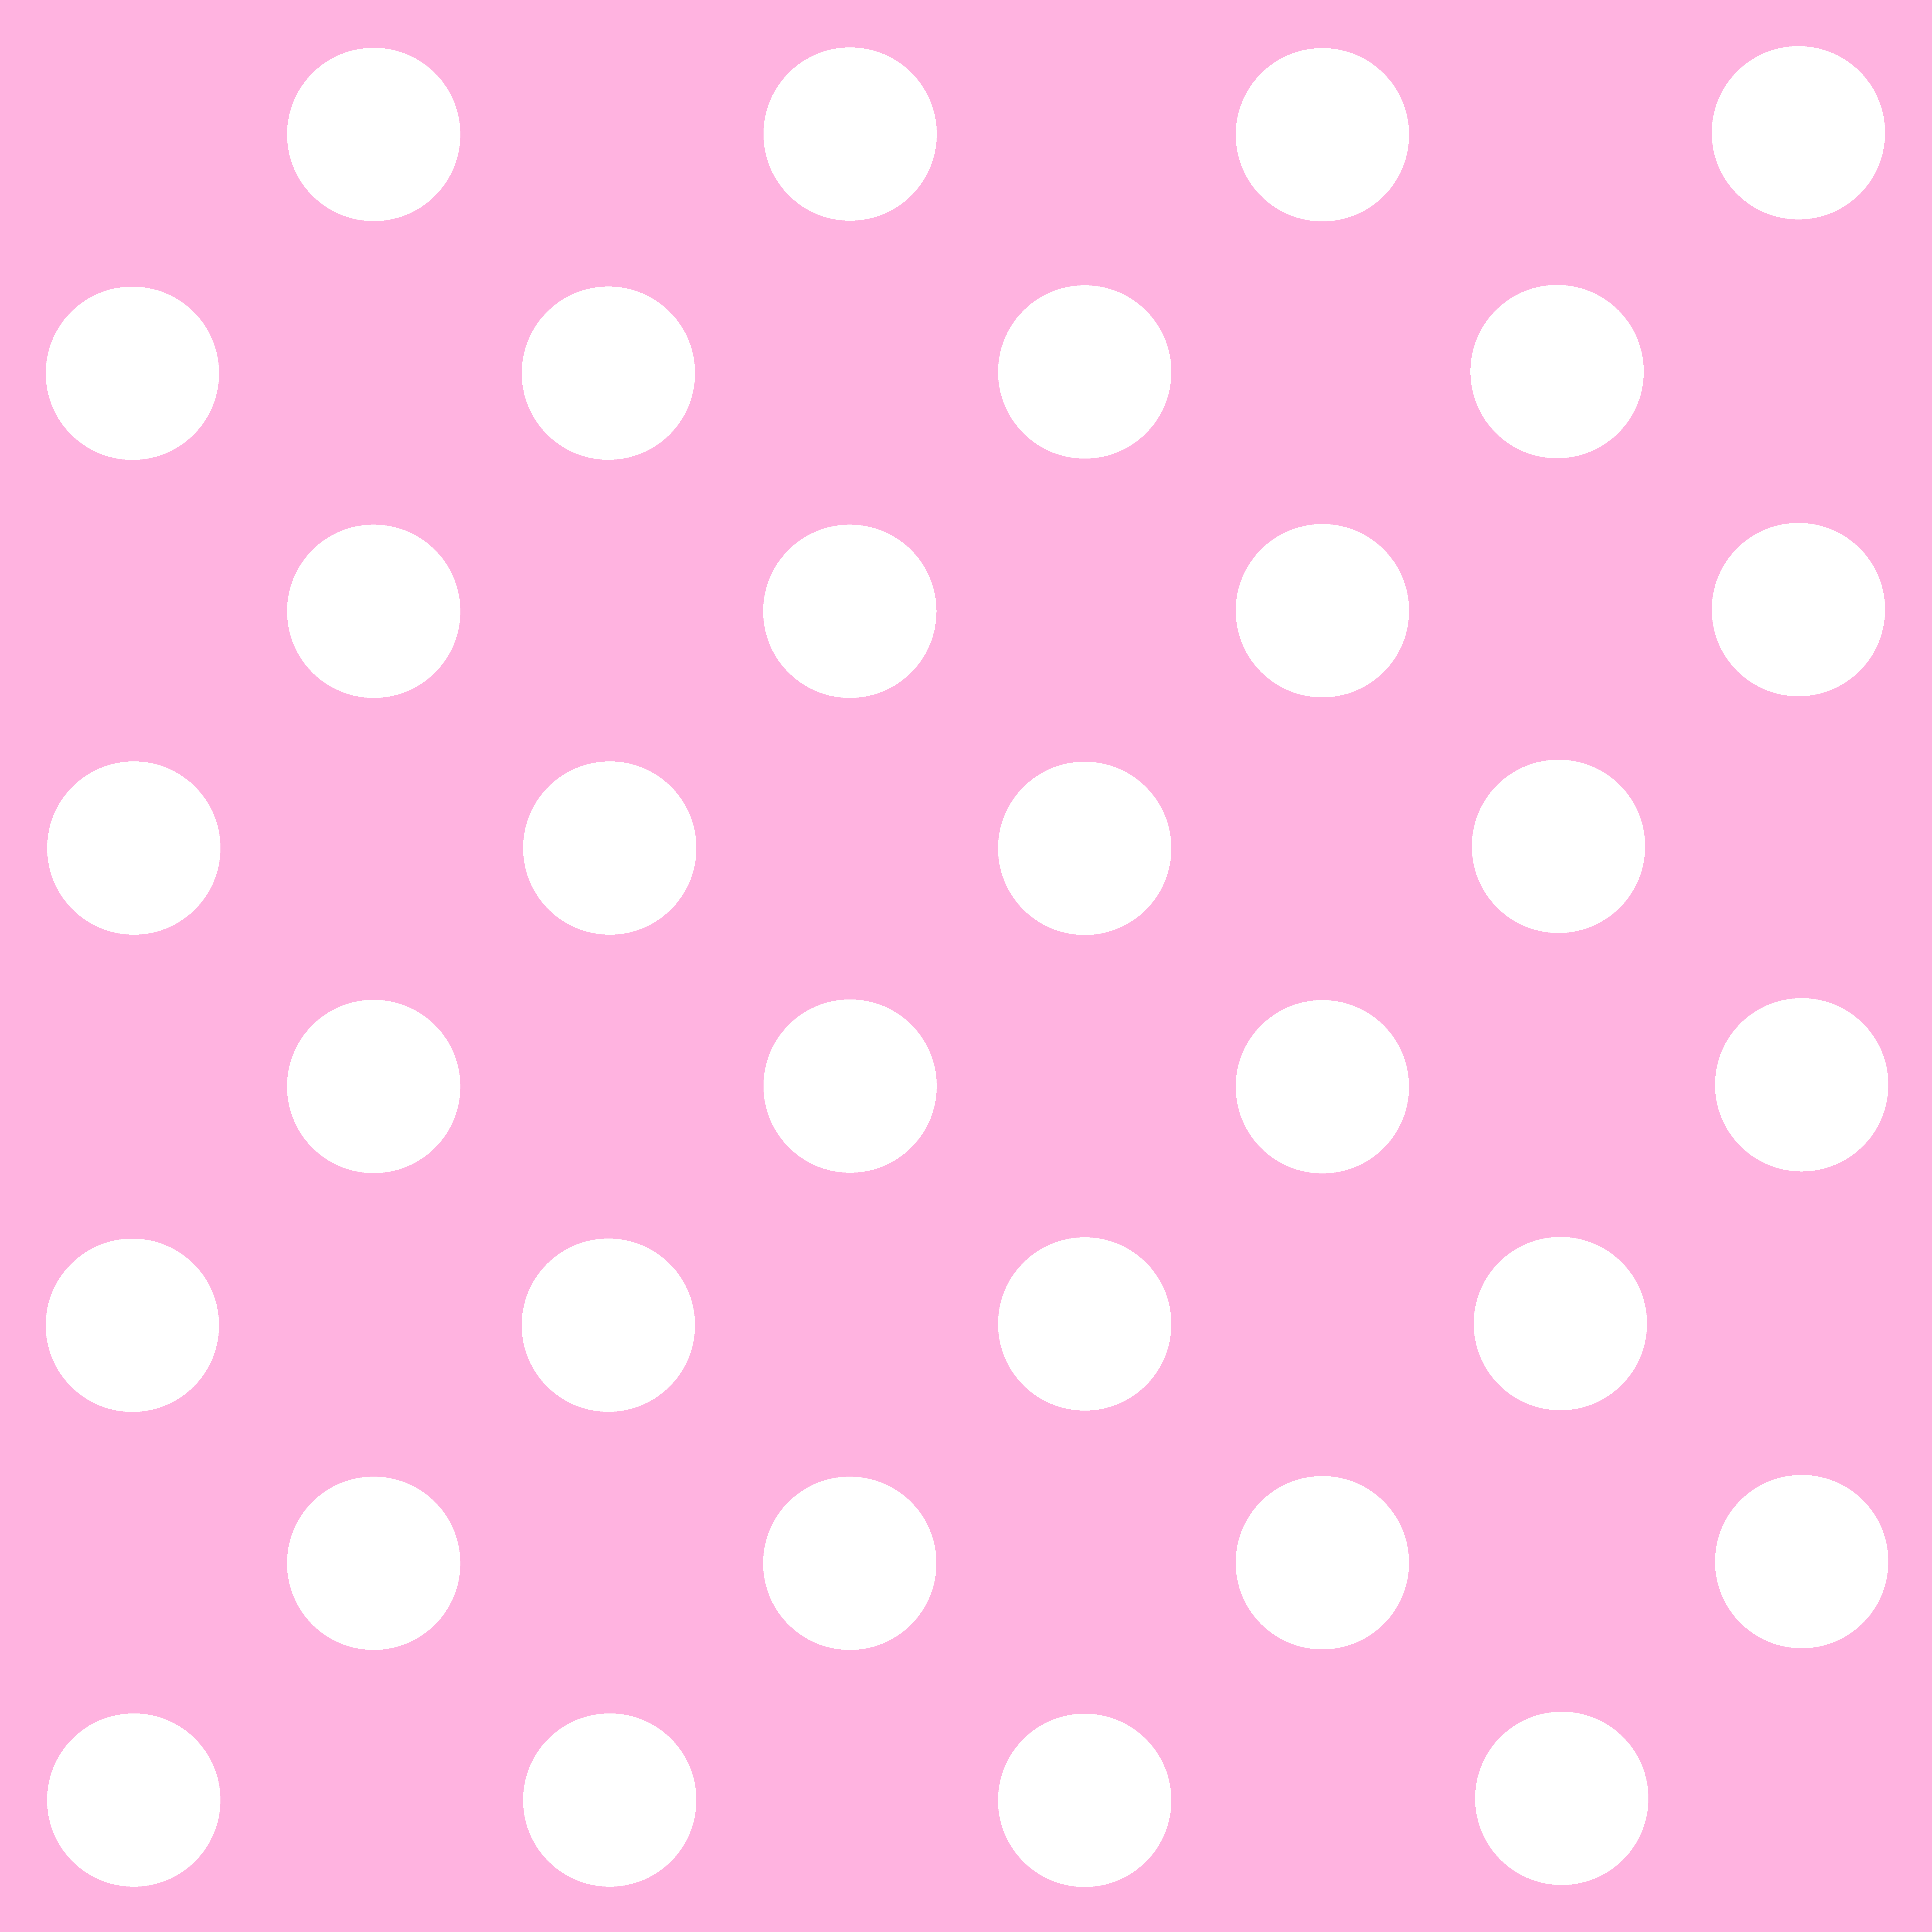 Pink polka dot clip art.